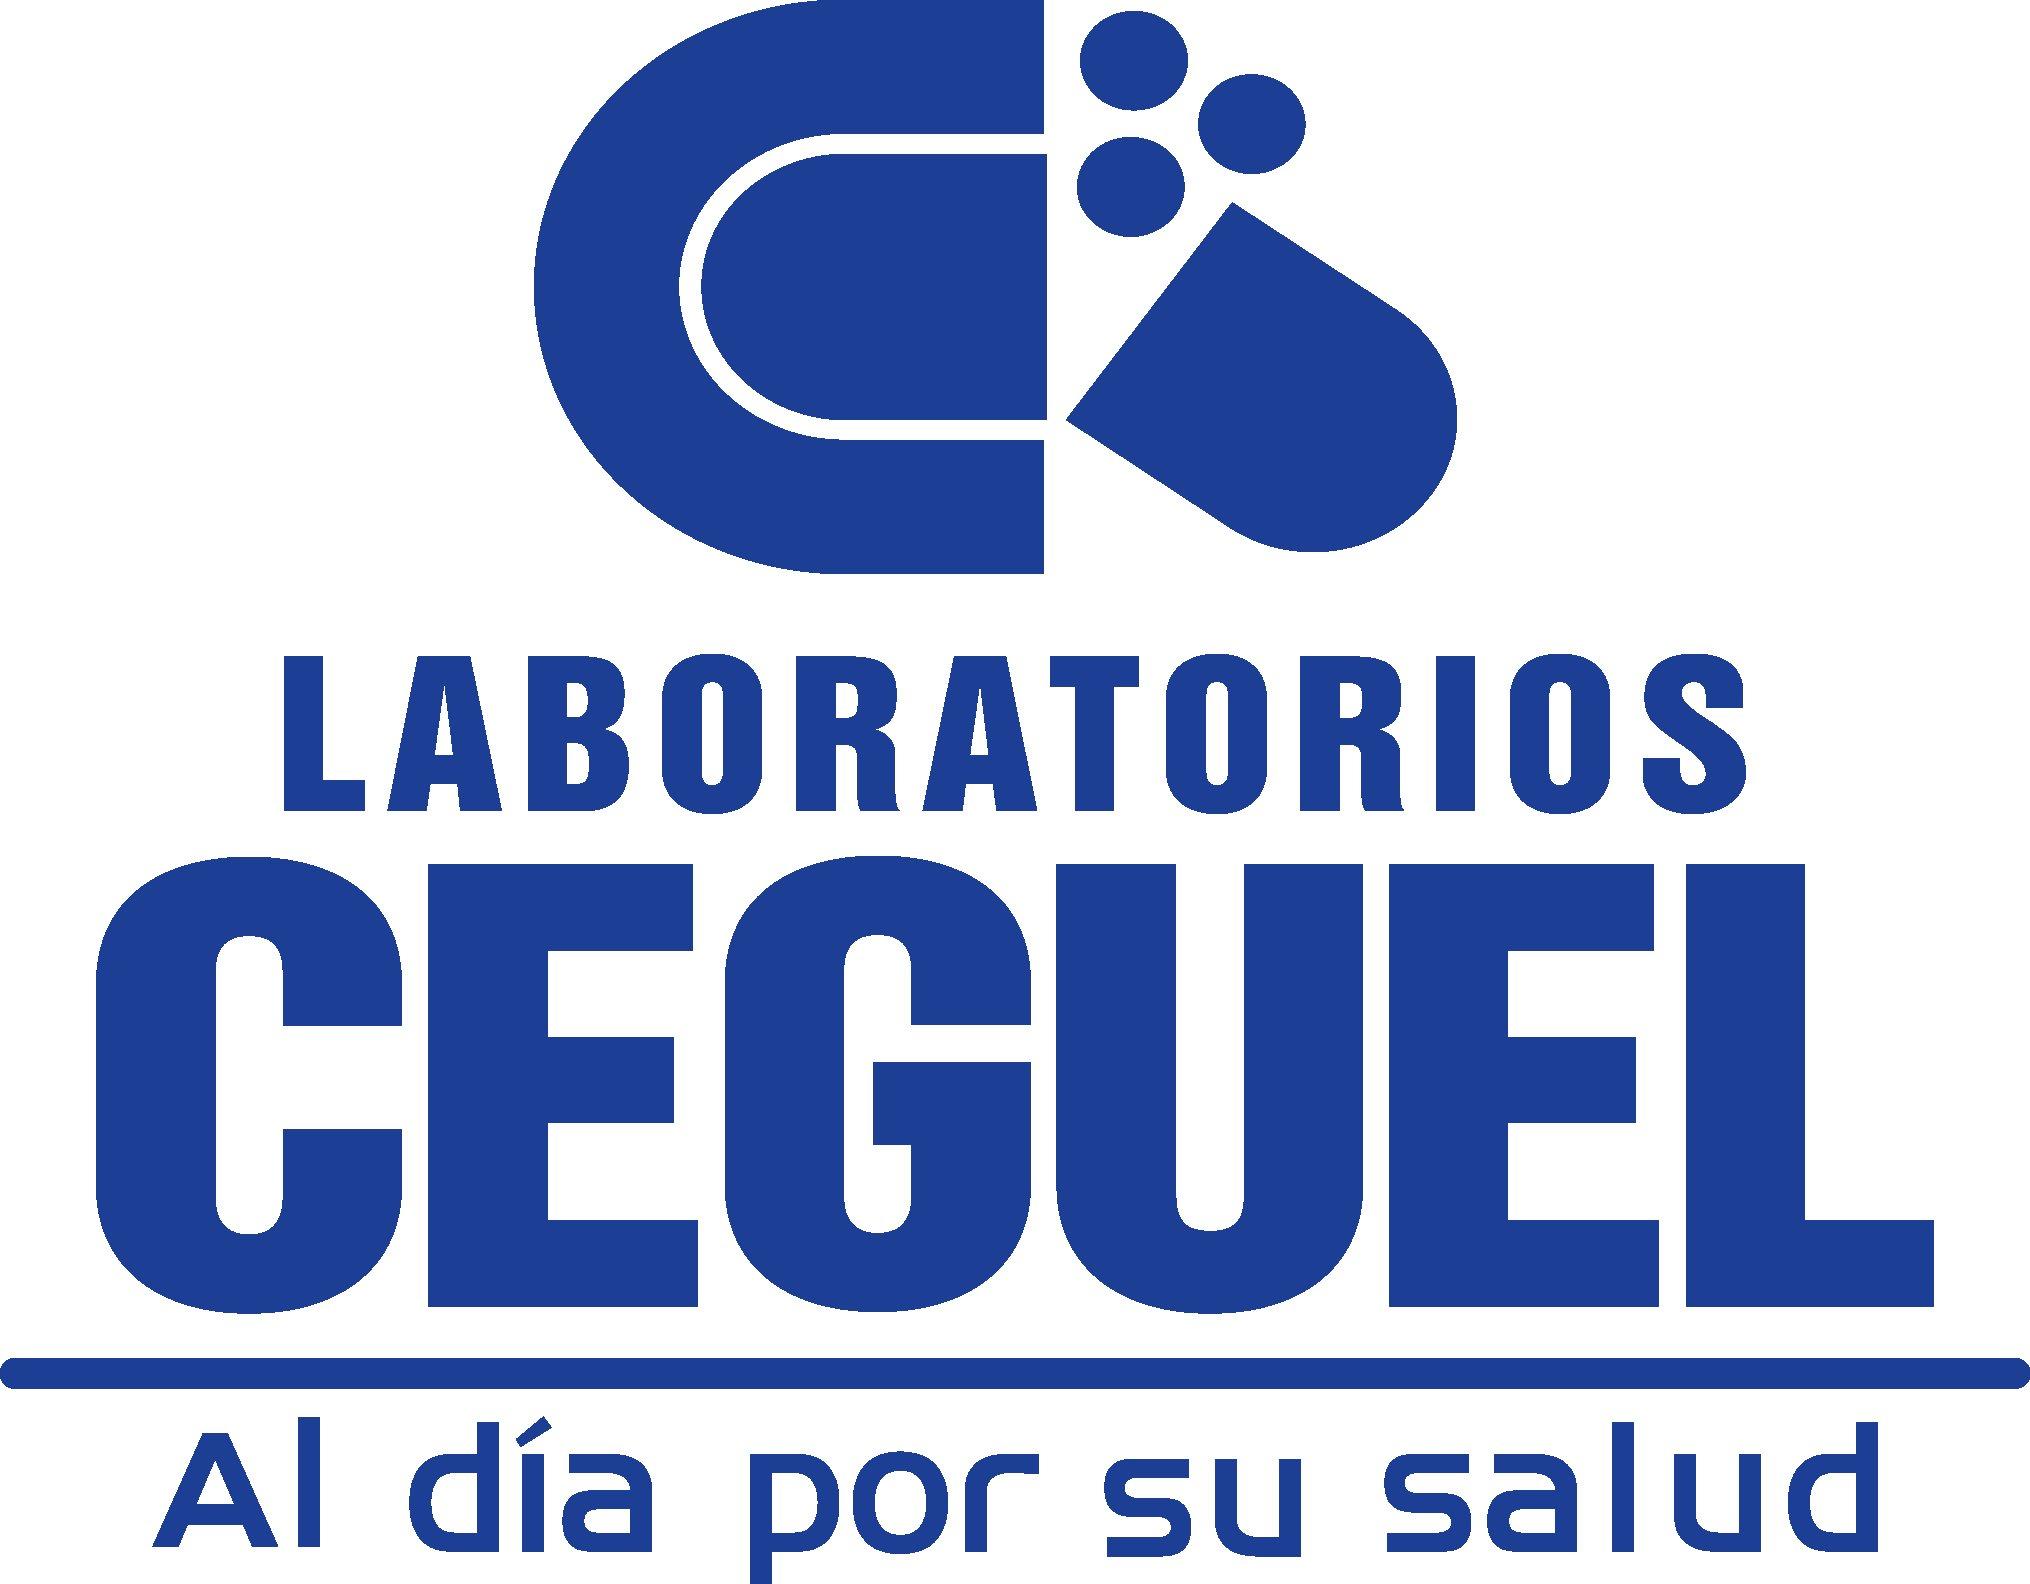 Laboratorios Ceguel S.A.